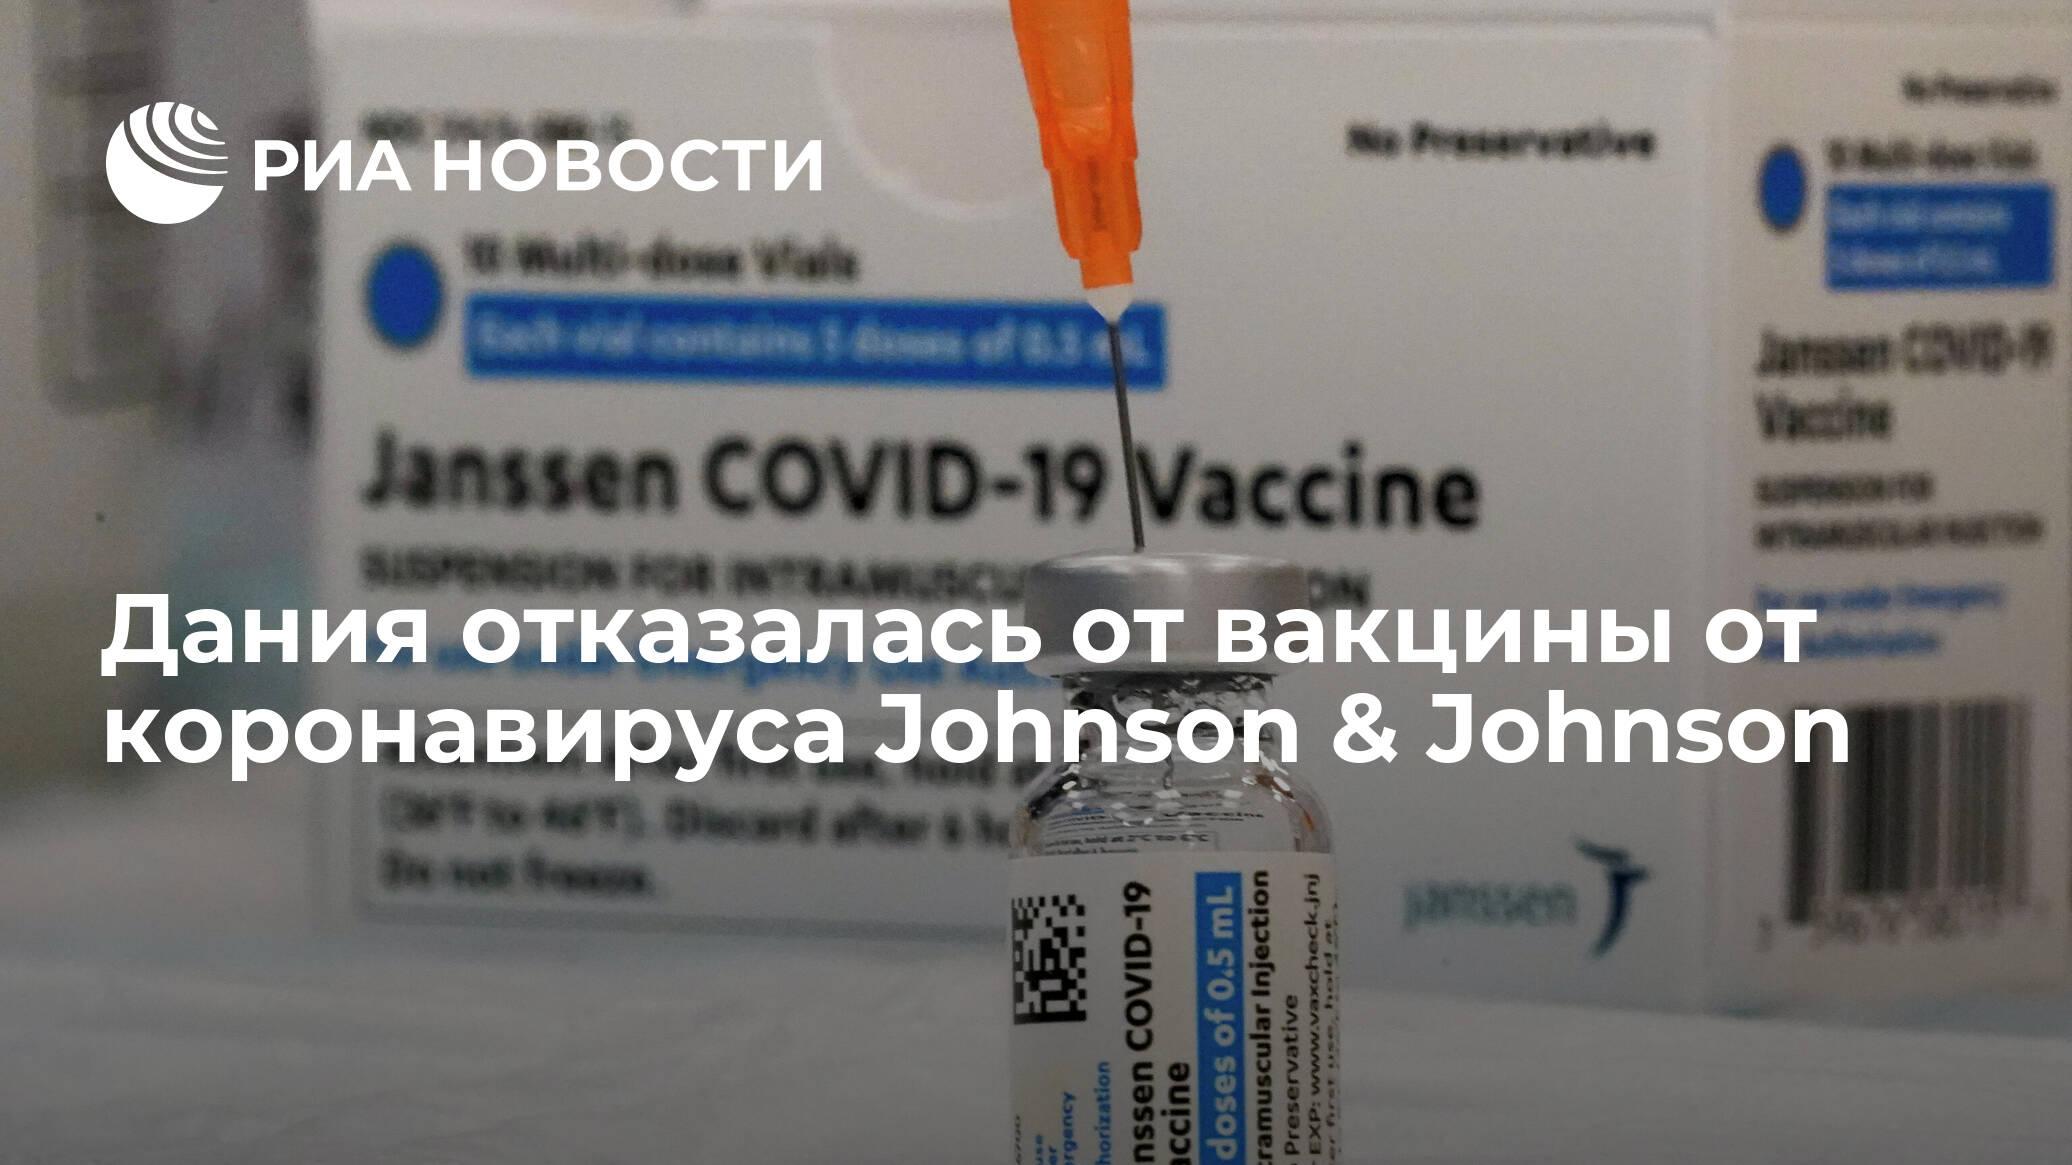 Дания отказалась от вакцины от коронавируса Johnson & Johnson